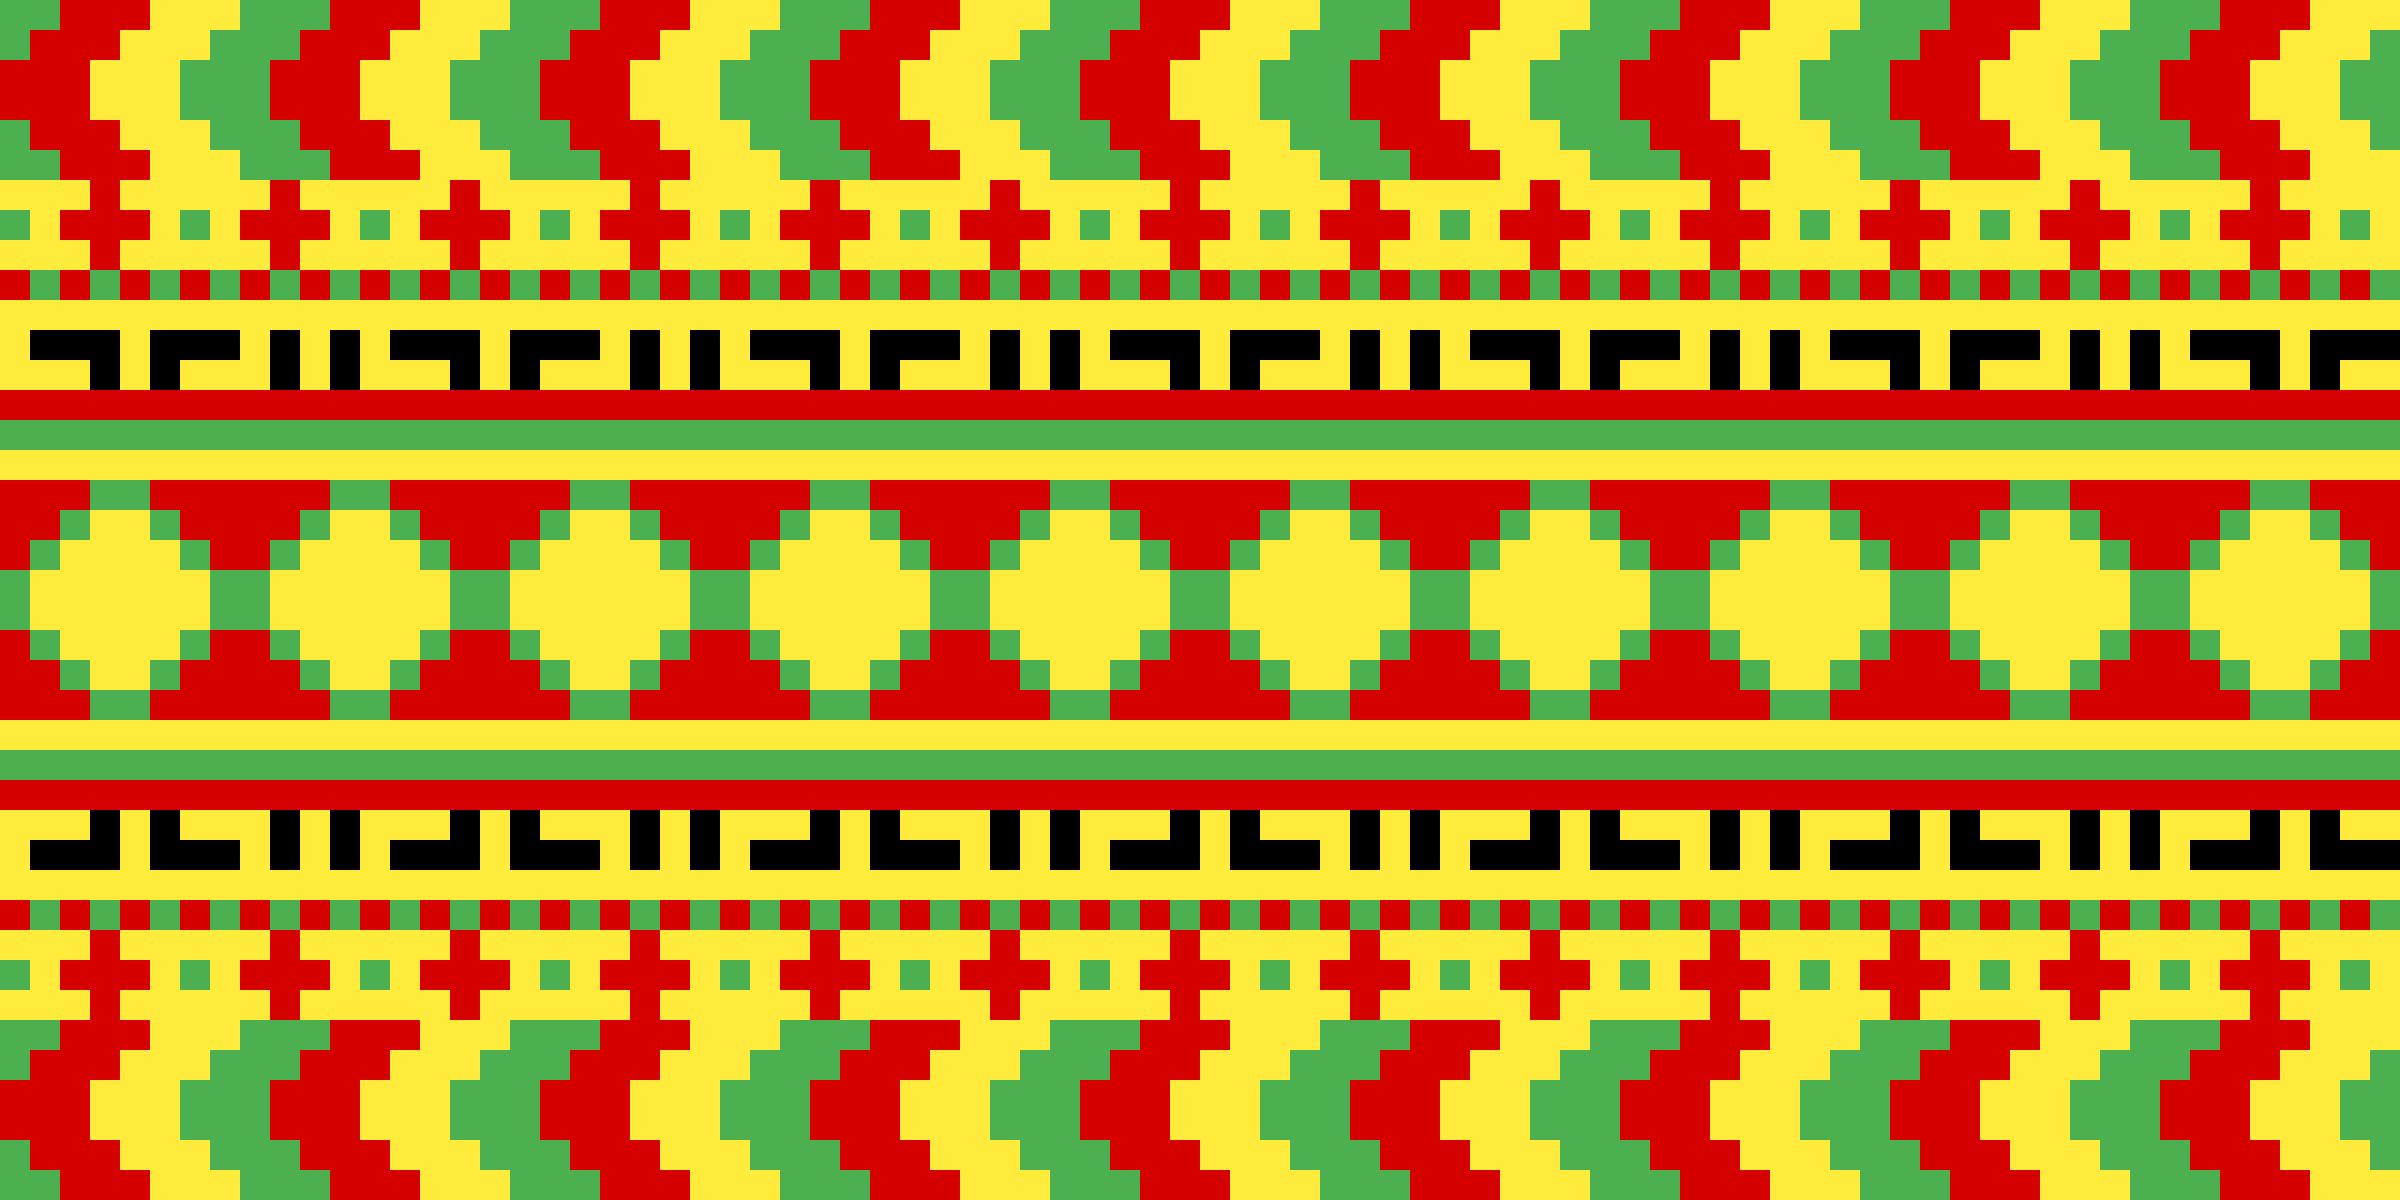 pixil-frame-0-4